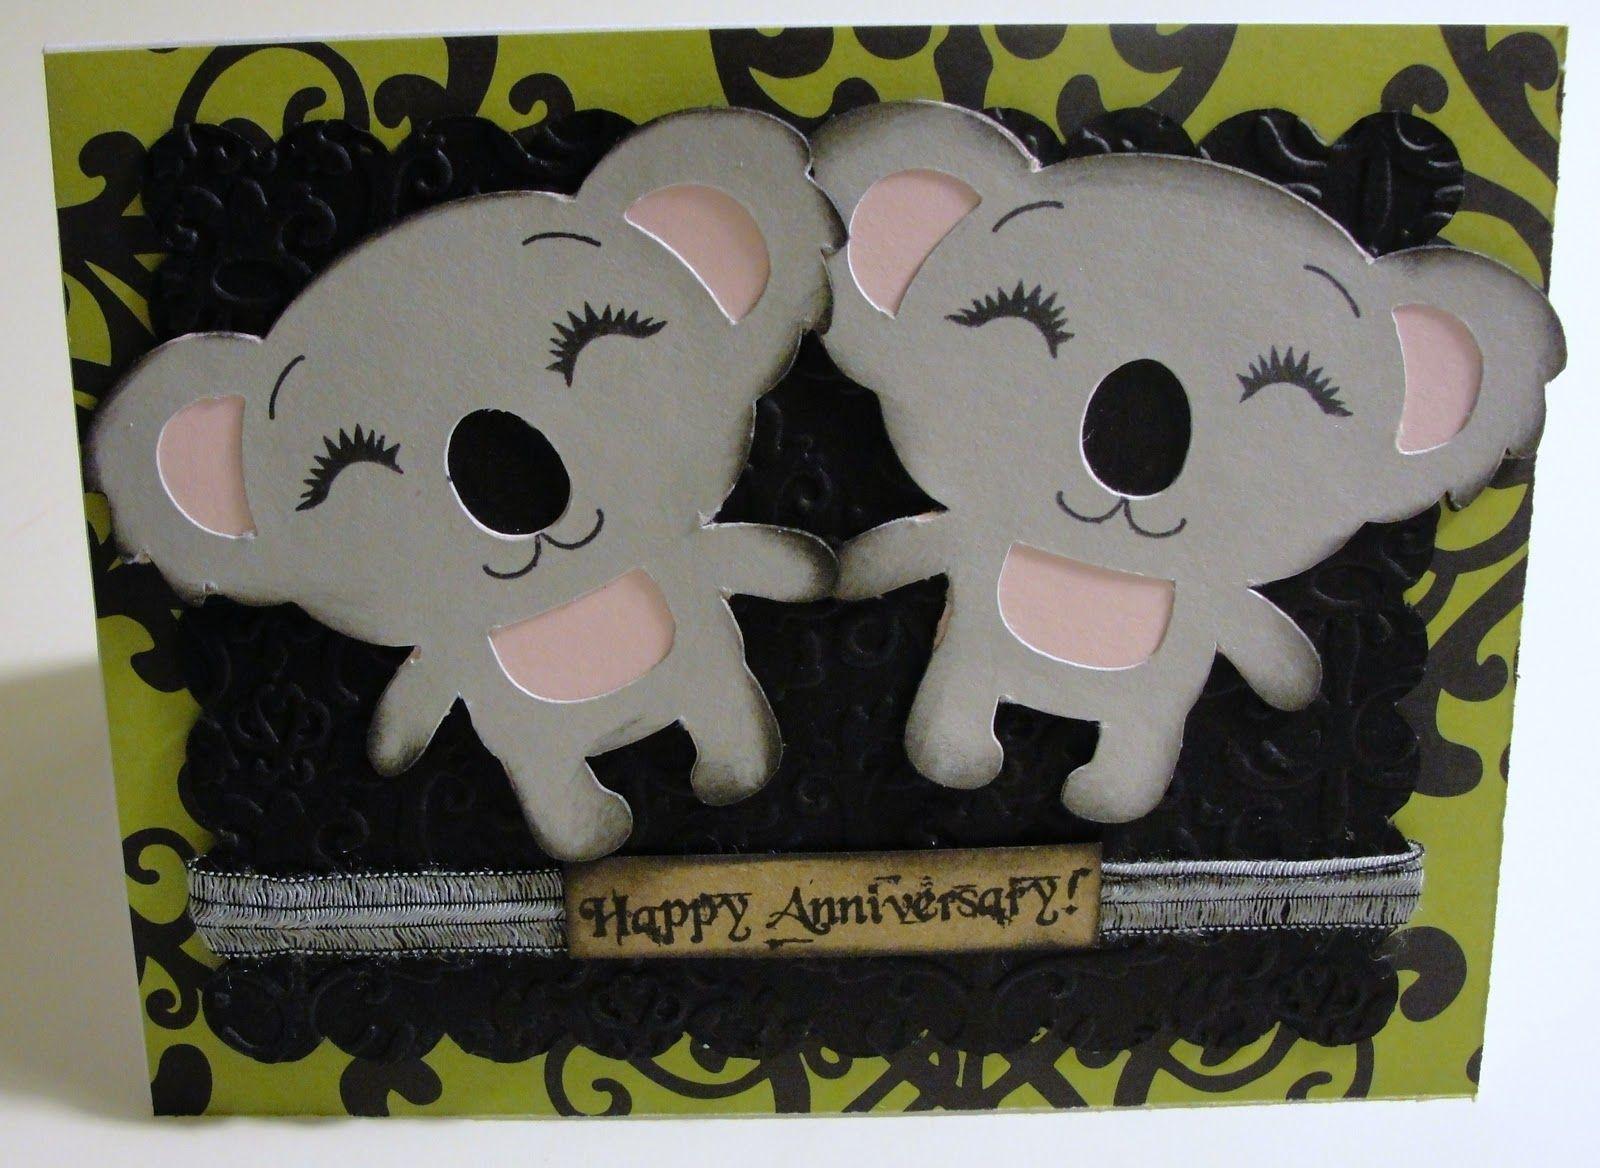 41 Koala Anniversary Cricut Anniversary Card Anniversary Cards Happy Anniversary